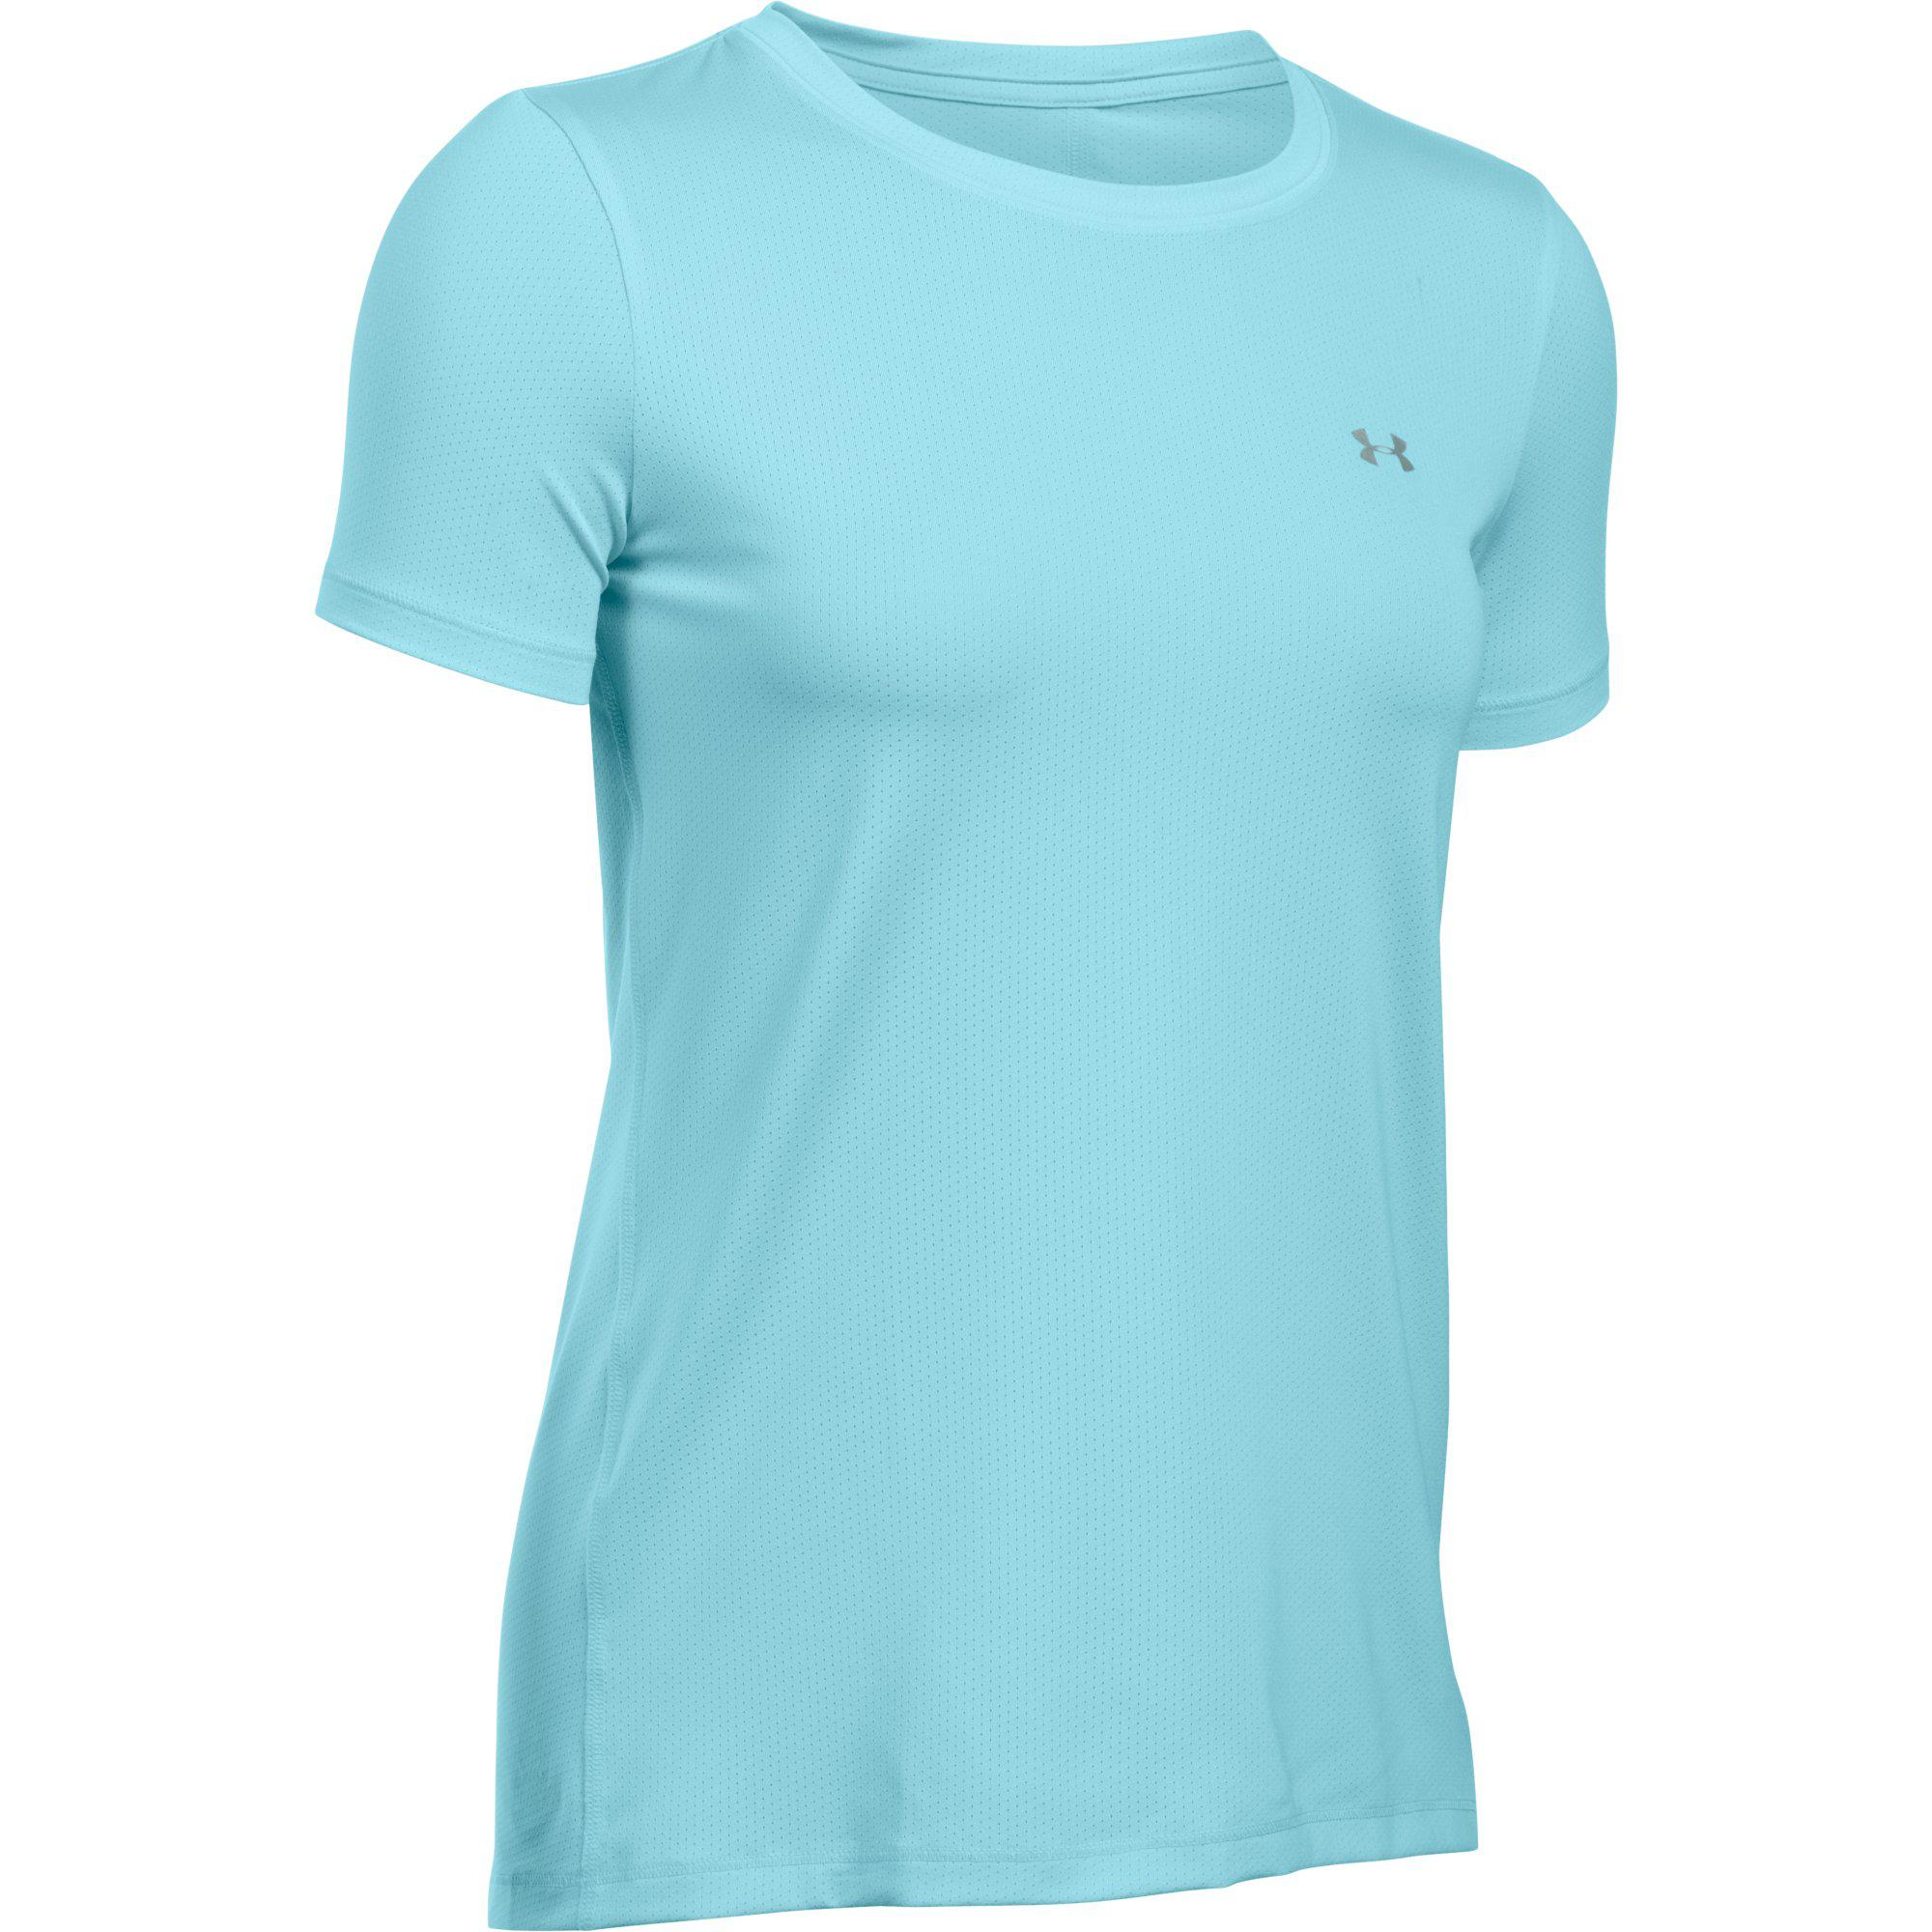 b74650e8 Under Armour Womens HeatGear Armour Short Sleeve Tee - Maui Blue -  Tennisnuts.com